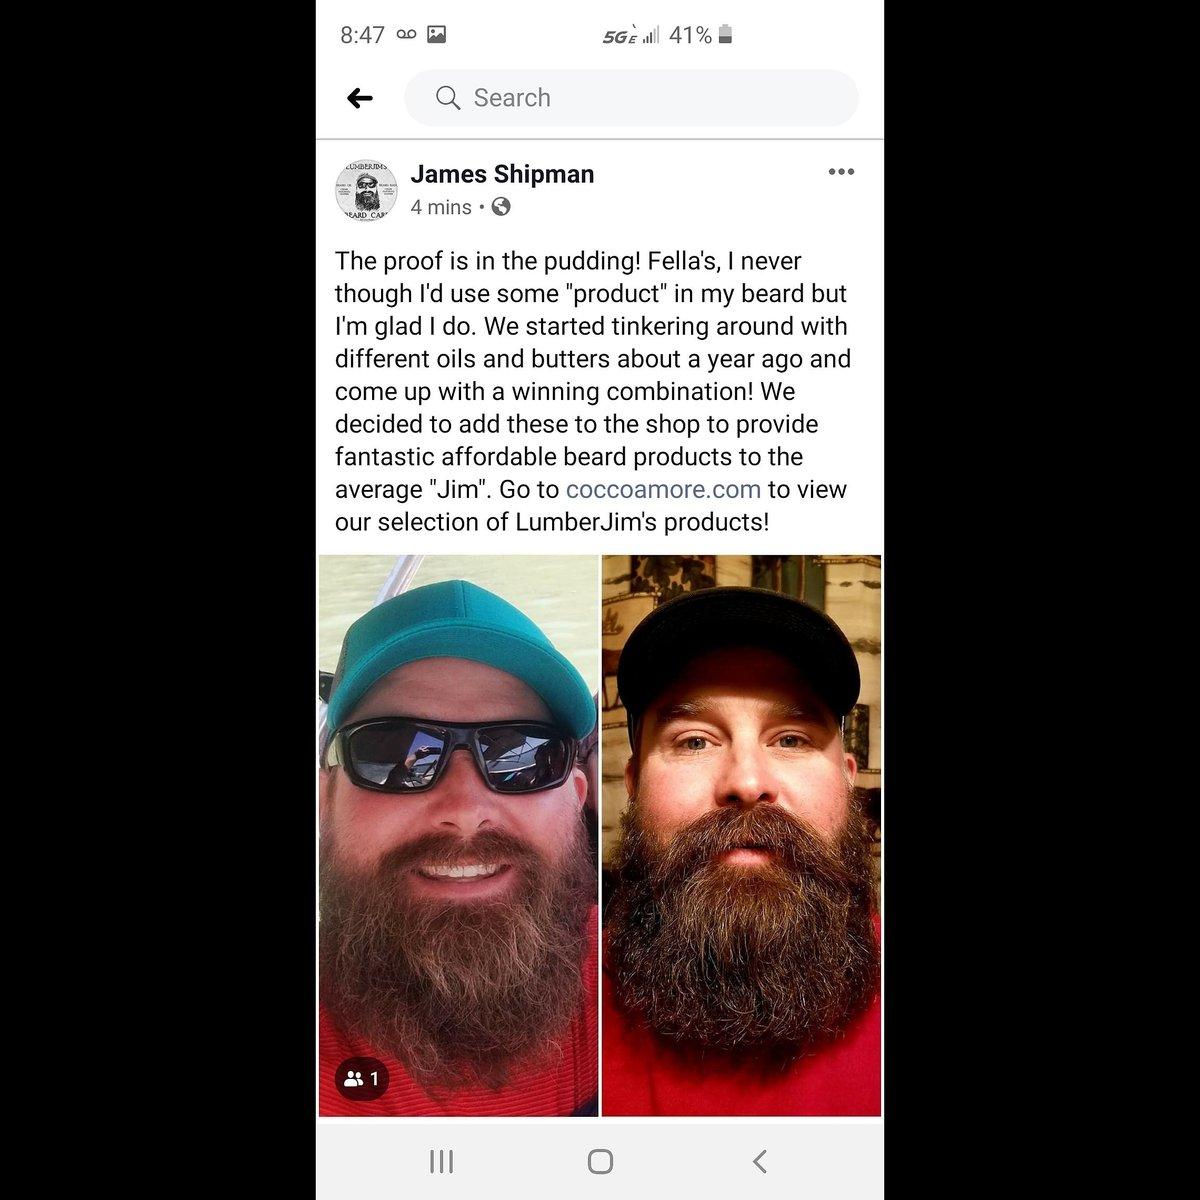 Love this!  #beards #bearded #beardo #beardwash #beardstyles #beardproducts #beardporn #beardseason #beard #beardsoap #LumberJim's #allnatural #handmade #insta #instagram #instagood #love #happy #nofilter #selfcare #selfcarematters #loveyourskin #naturalskincarepic.twitter.com/lMexAHzgXu